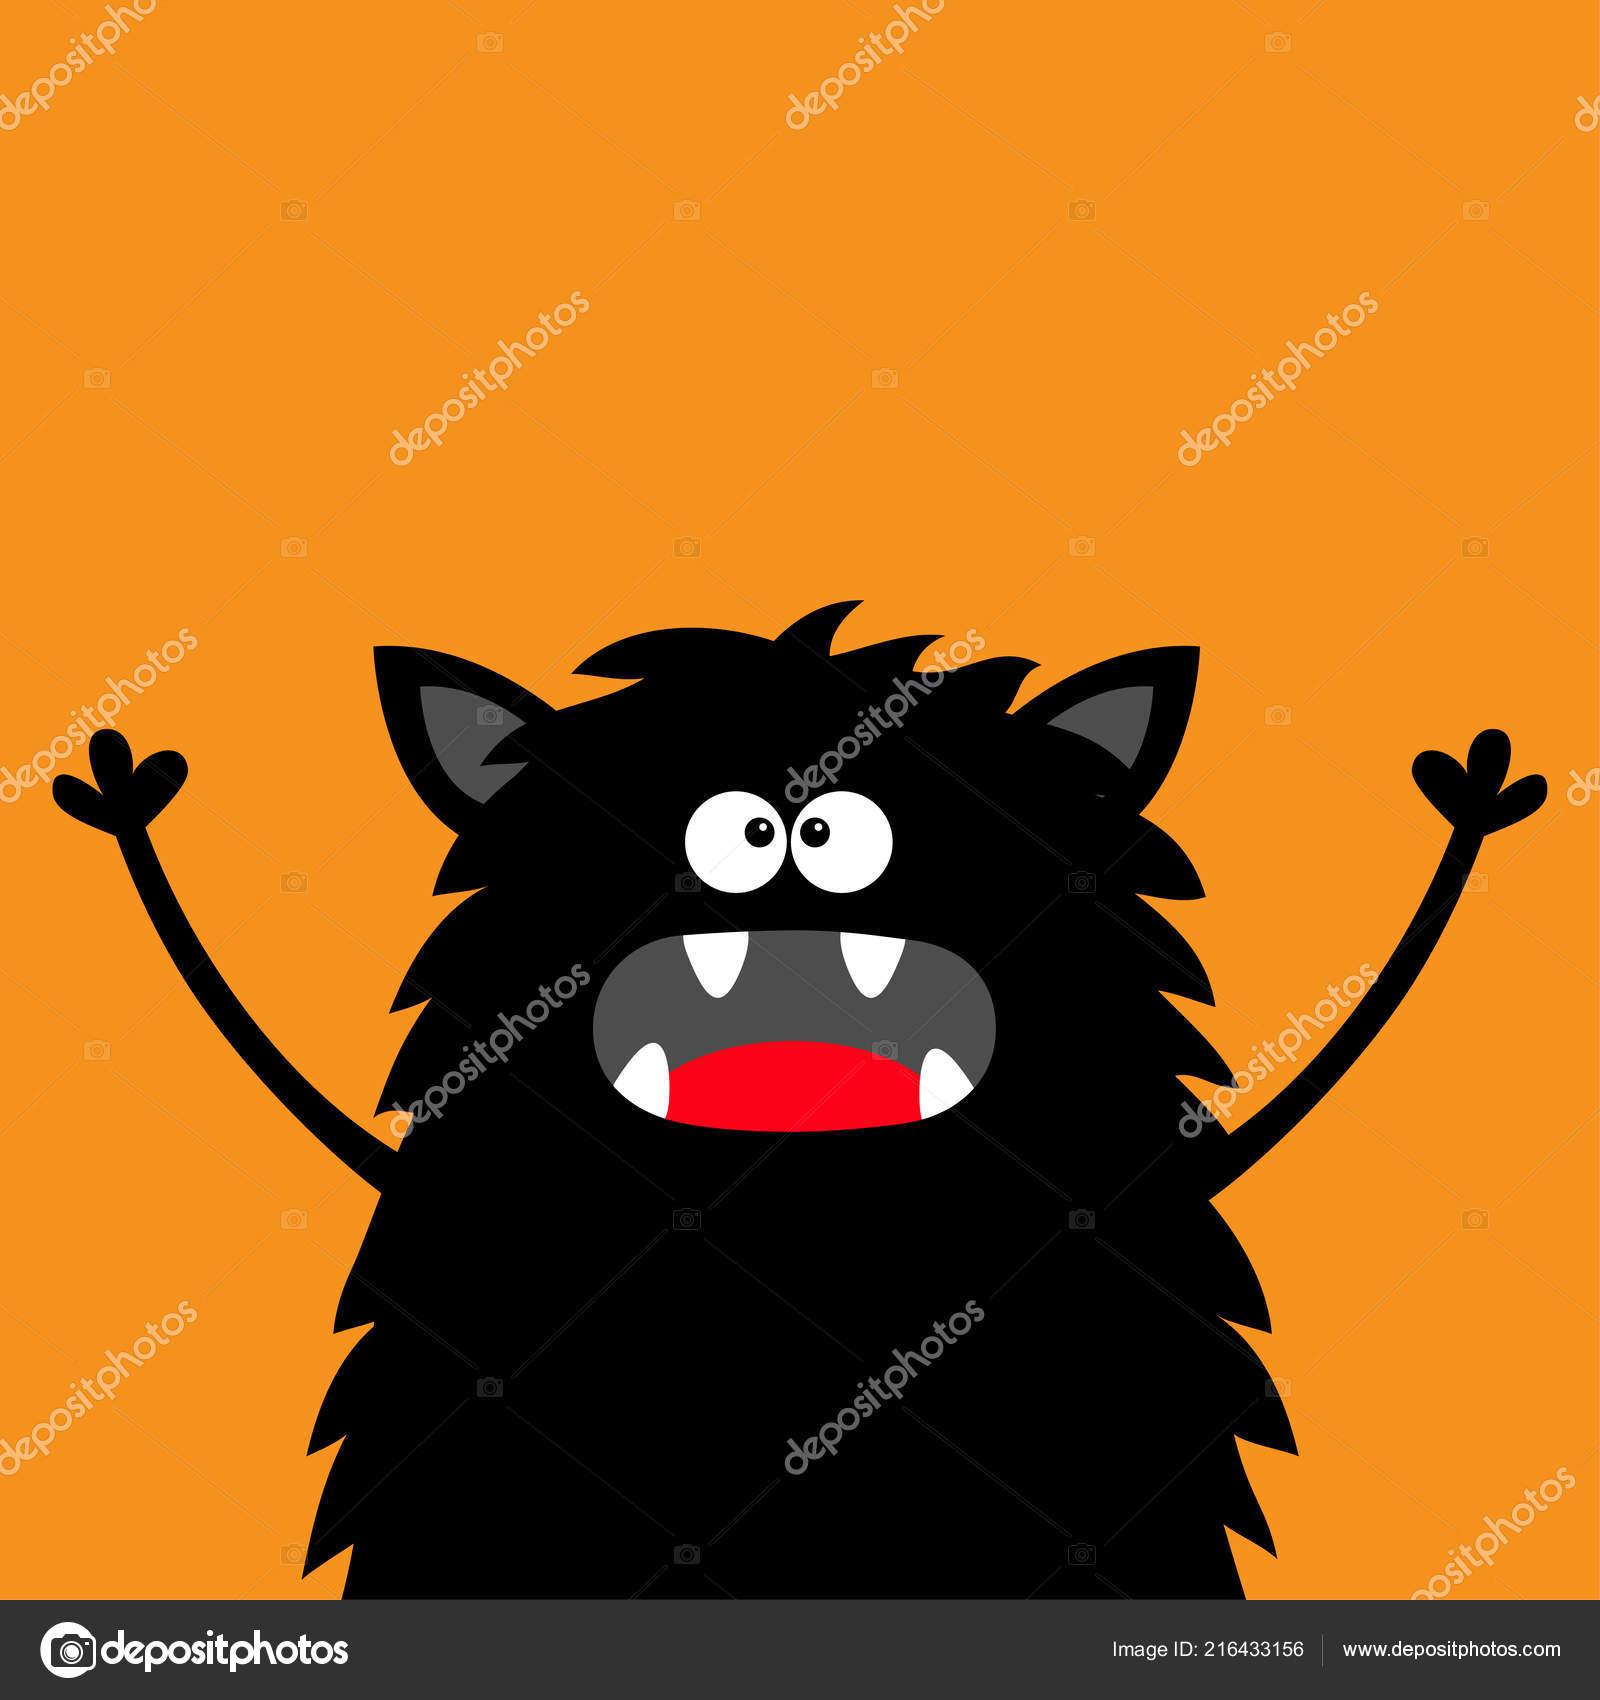 Cute Black Silhouette Monster Face Icon Happy Halloween Cartoon